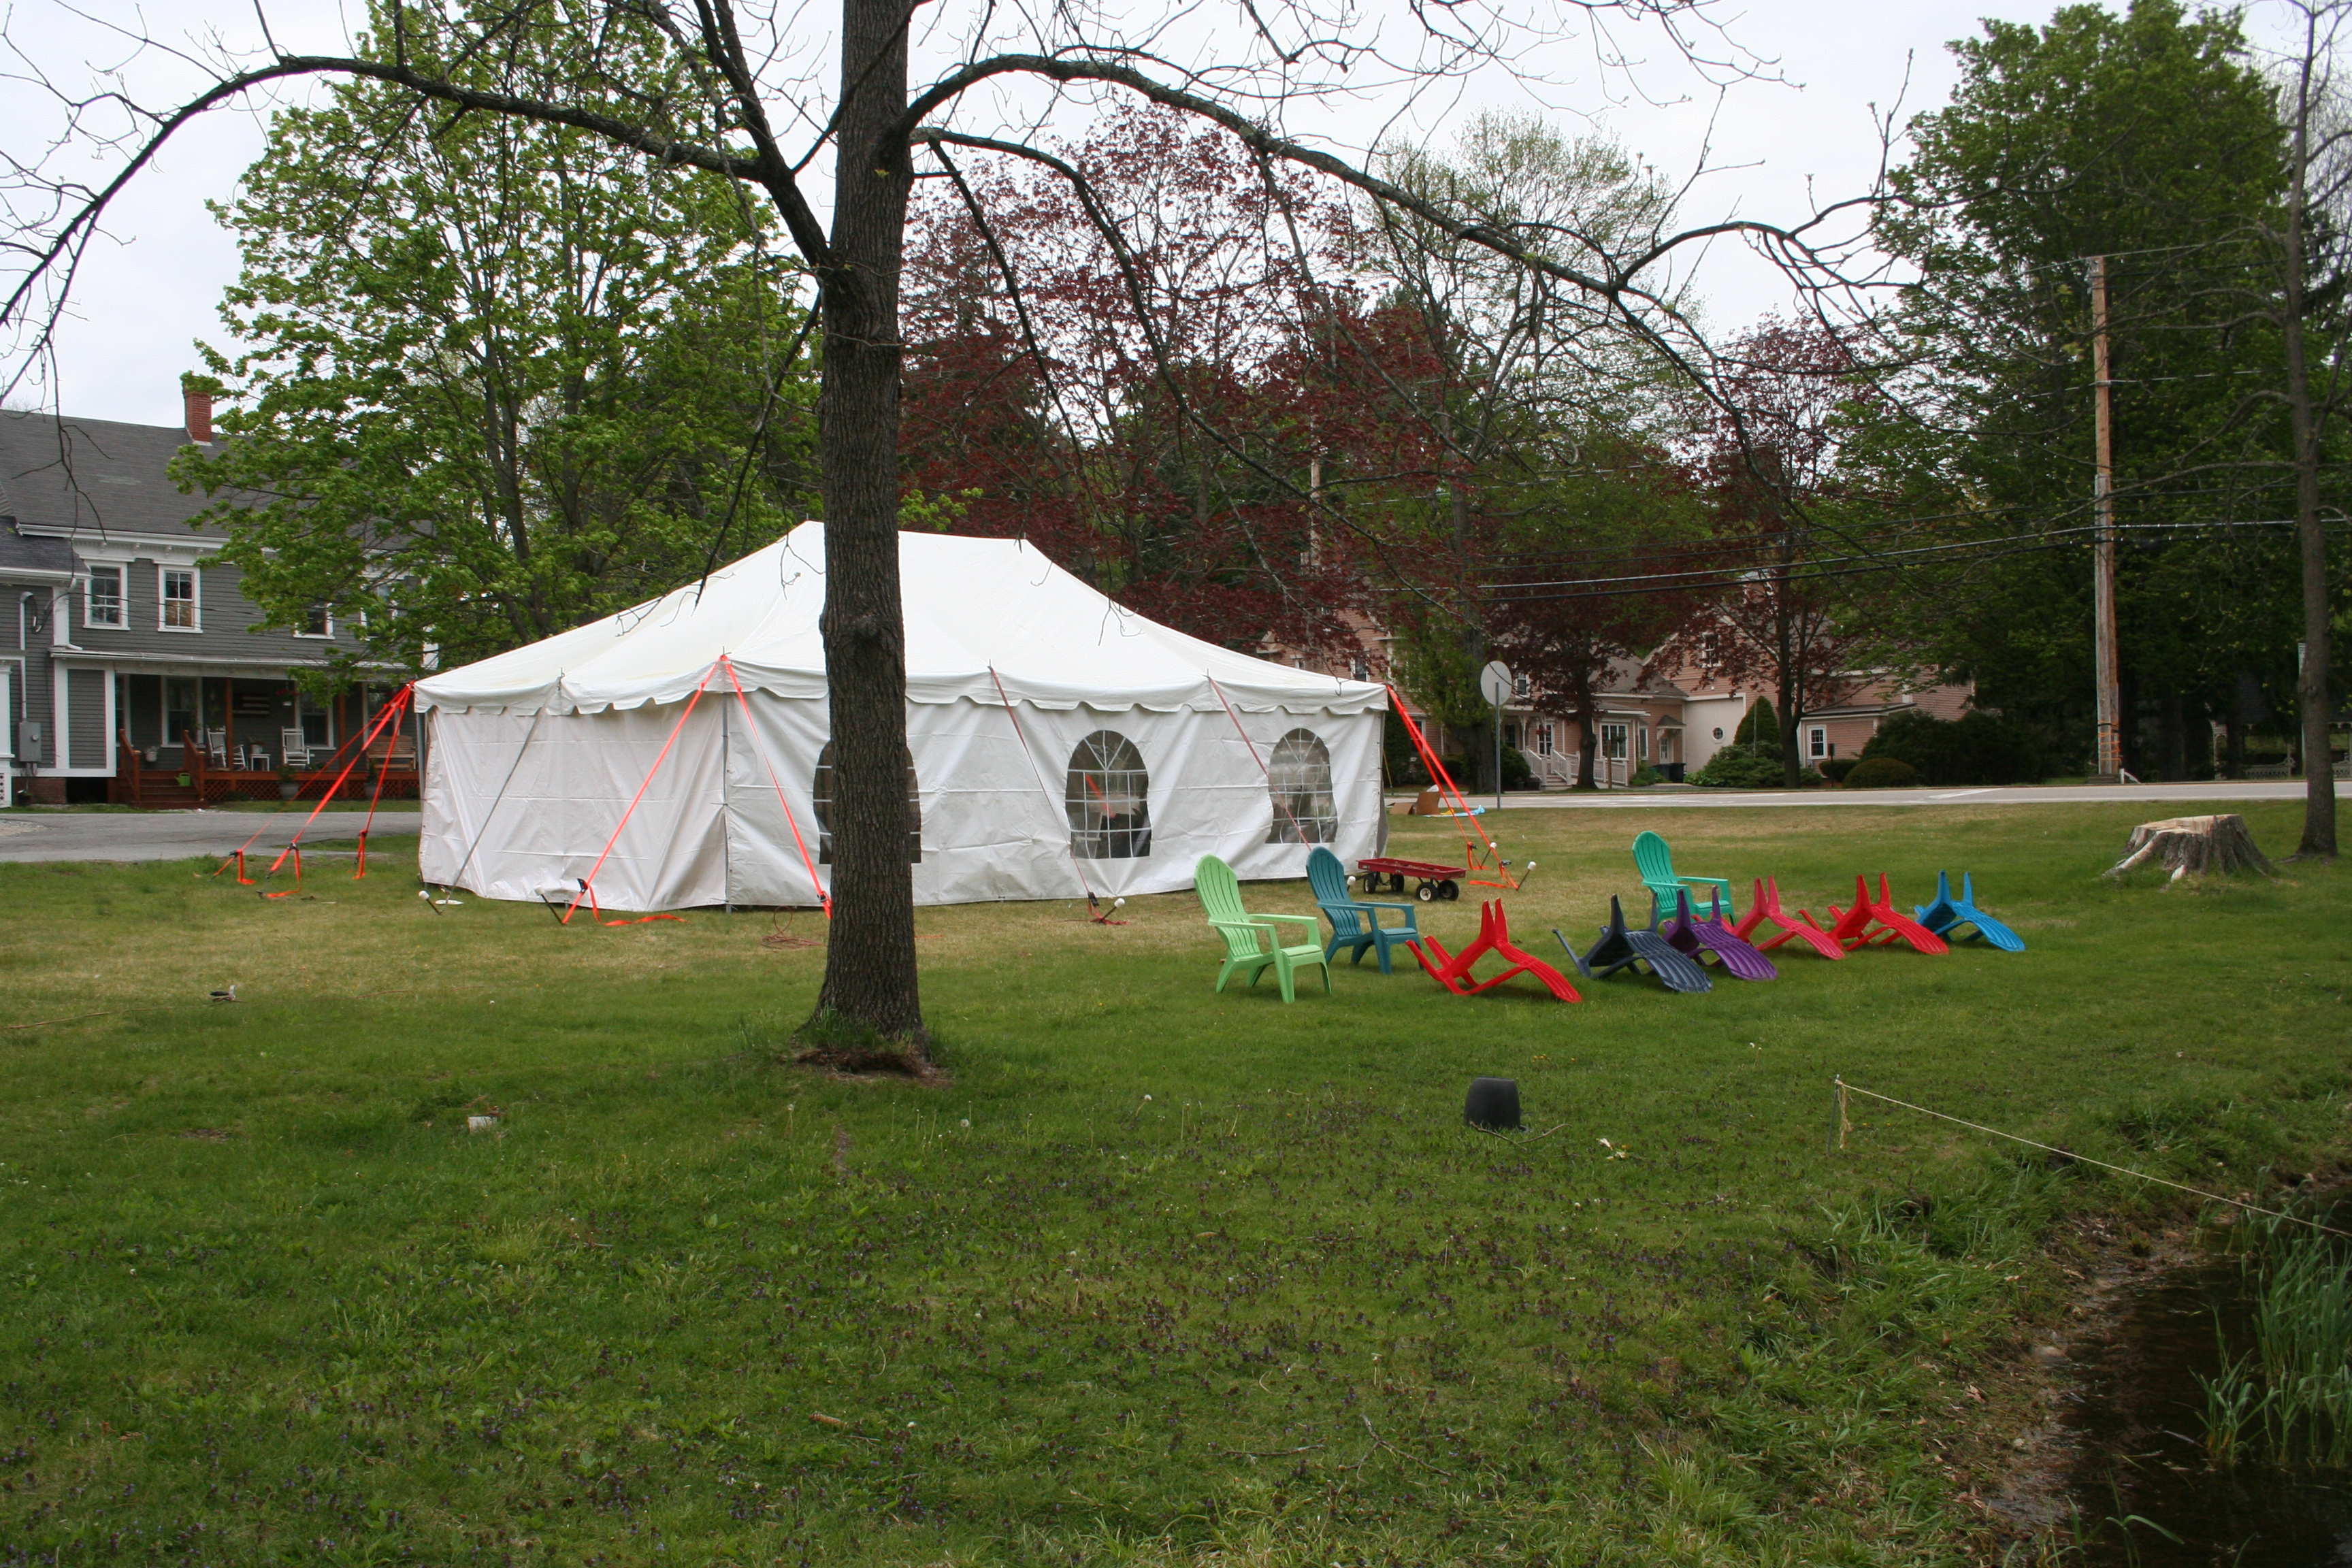 Gospel Tent service